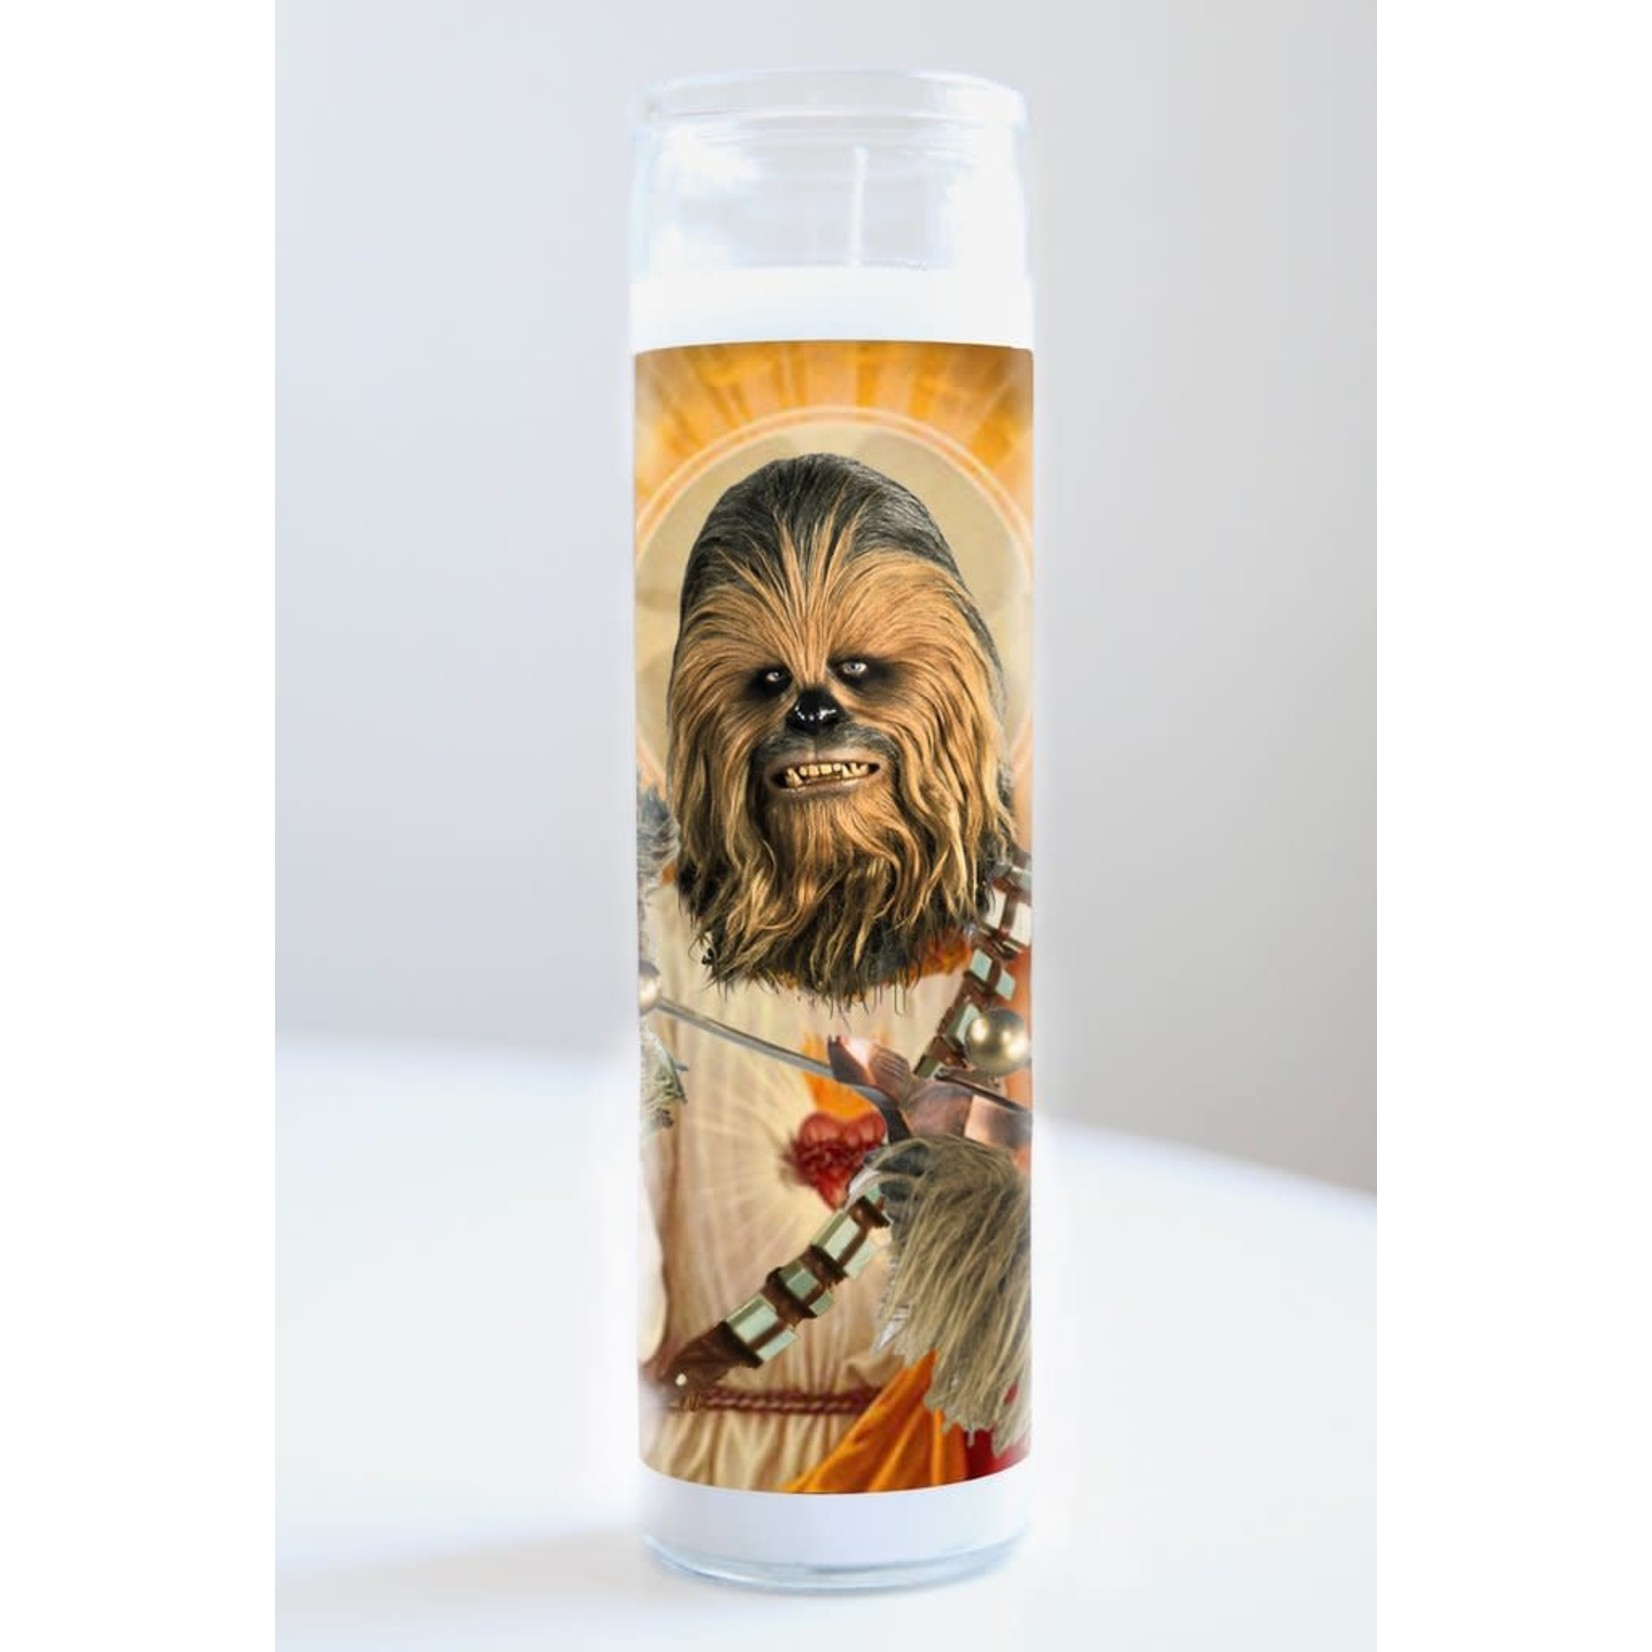 Candle - Chewbacca